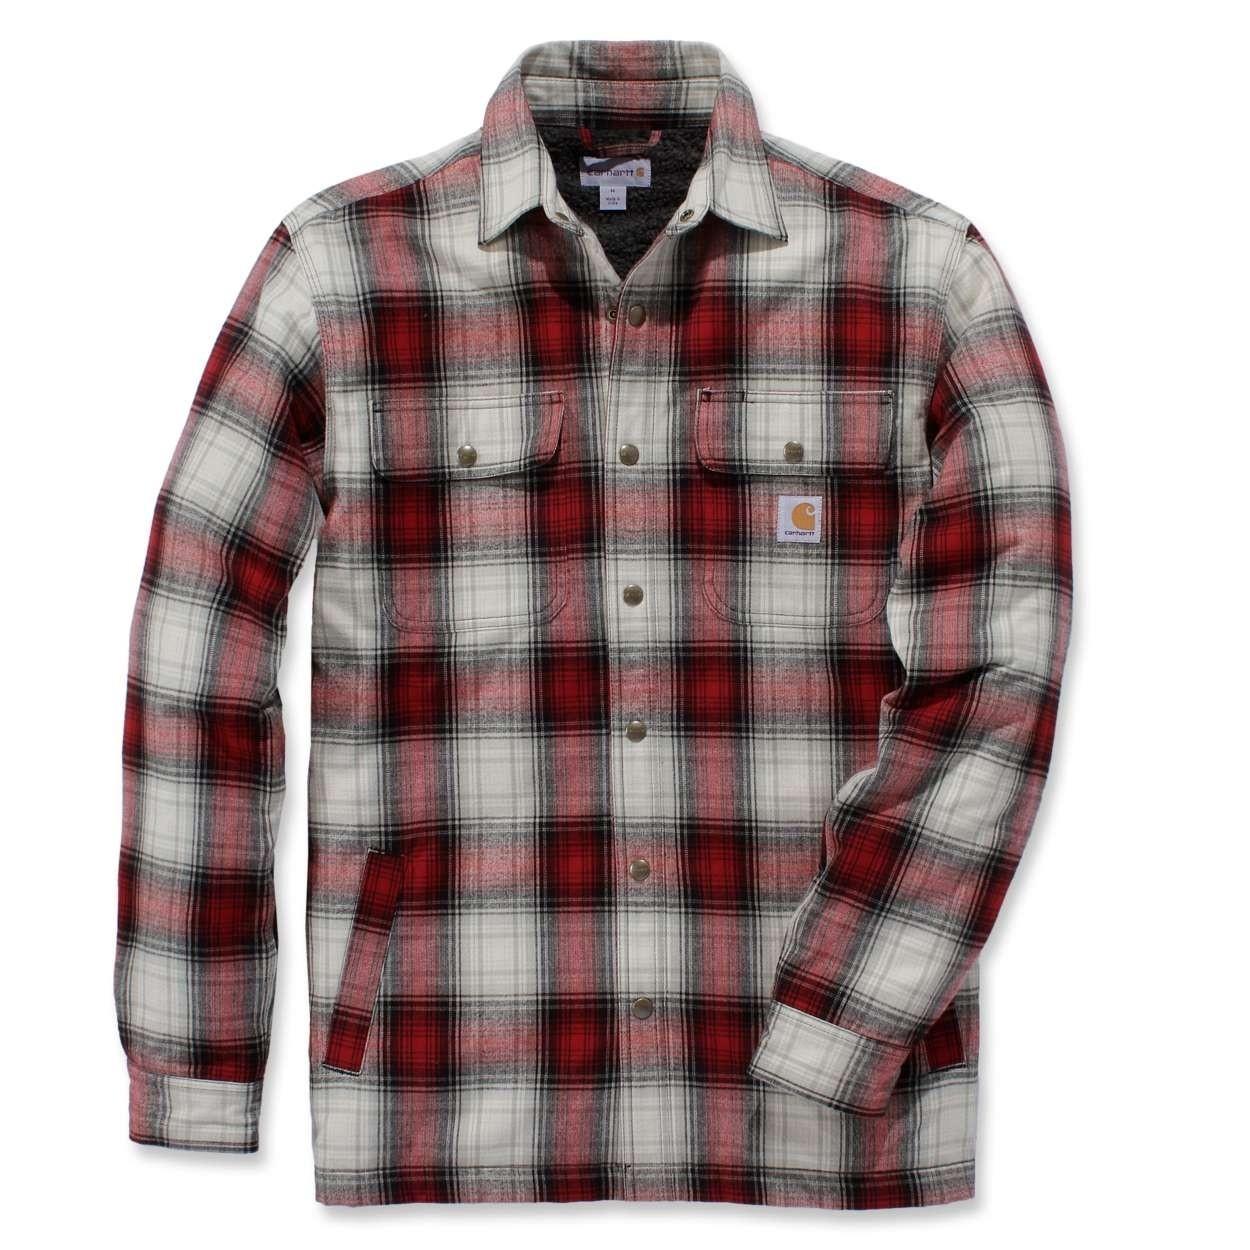 Carhartt Sherpa Lined Shirt Jacket : Dark Crimson